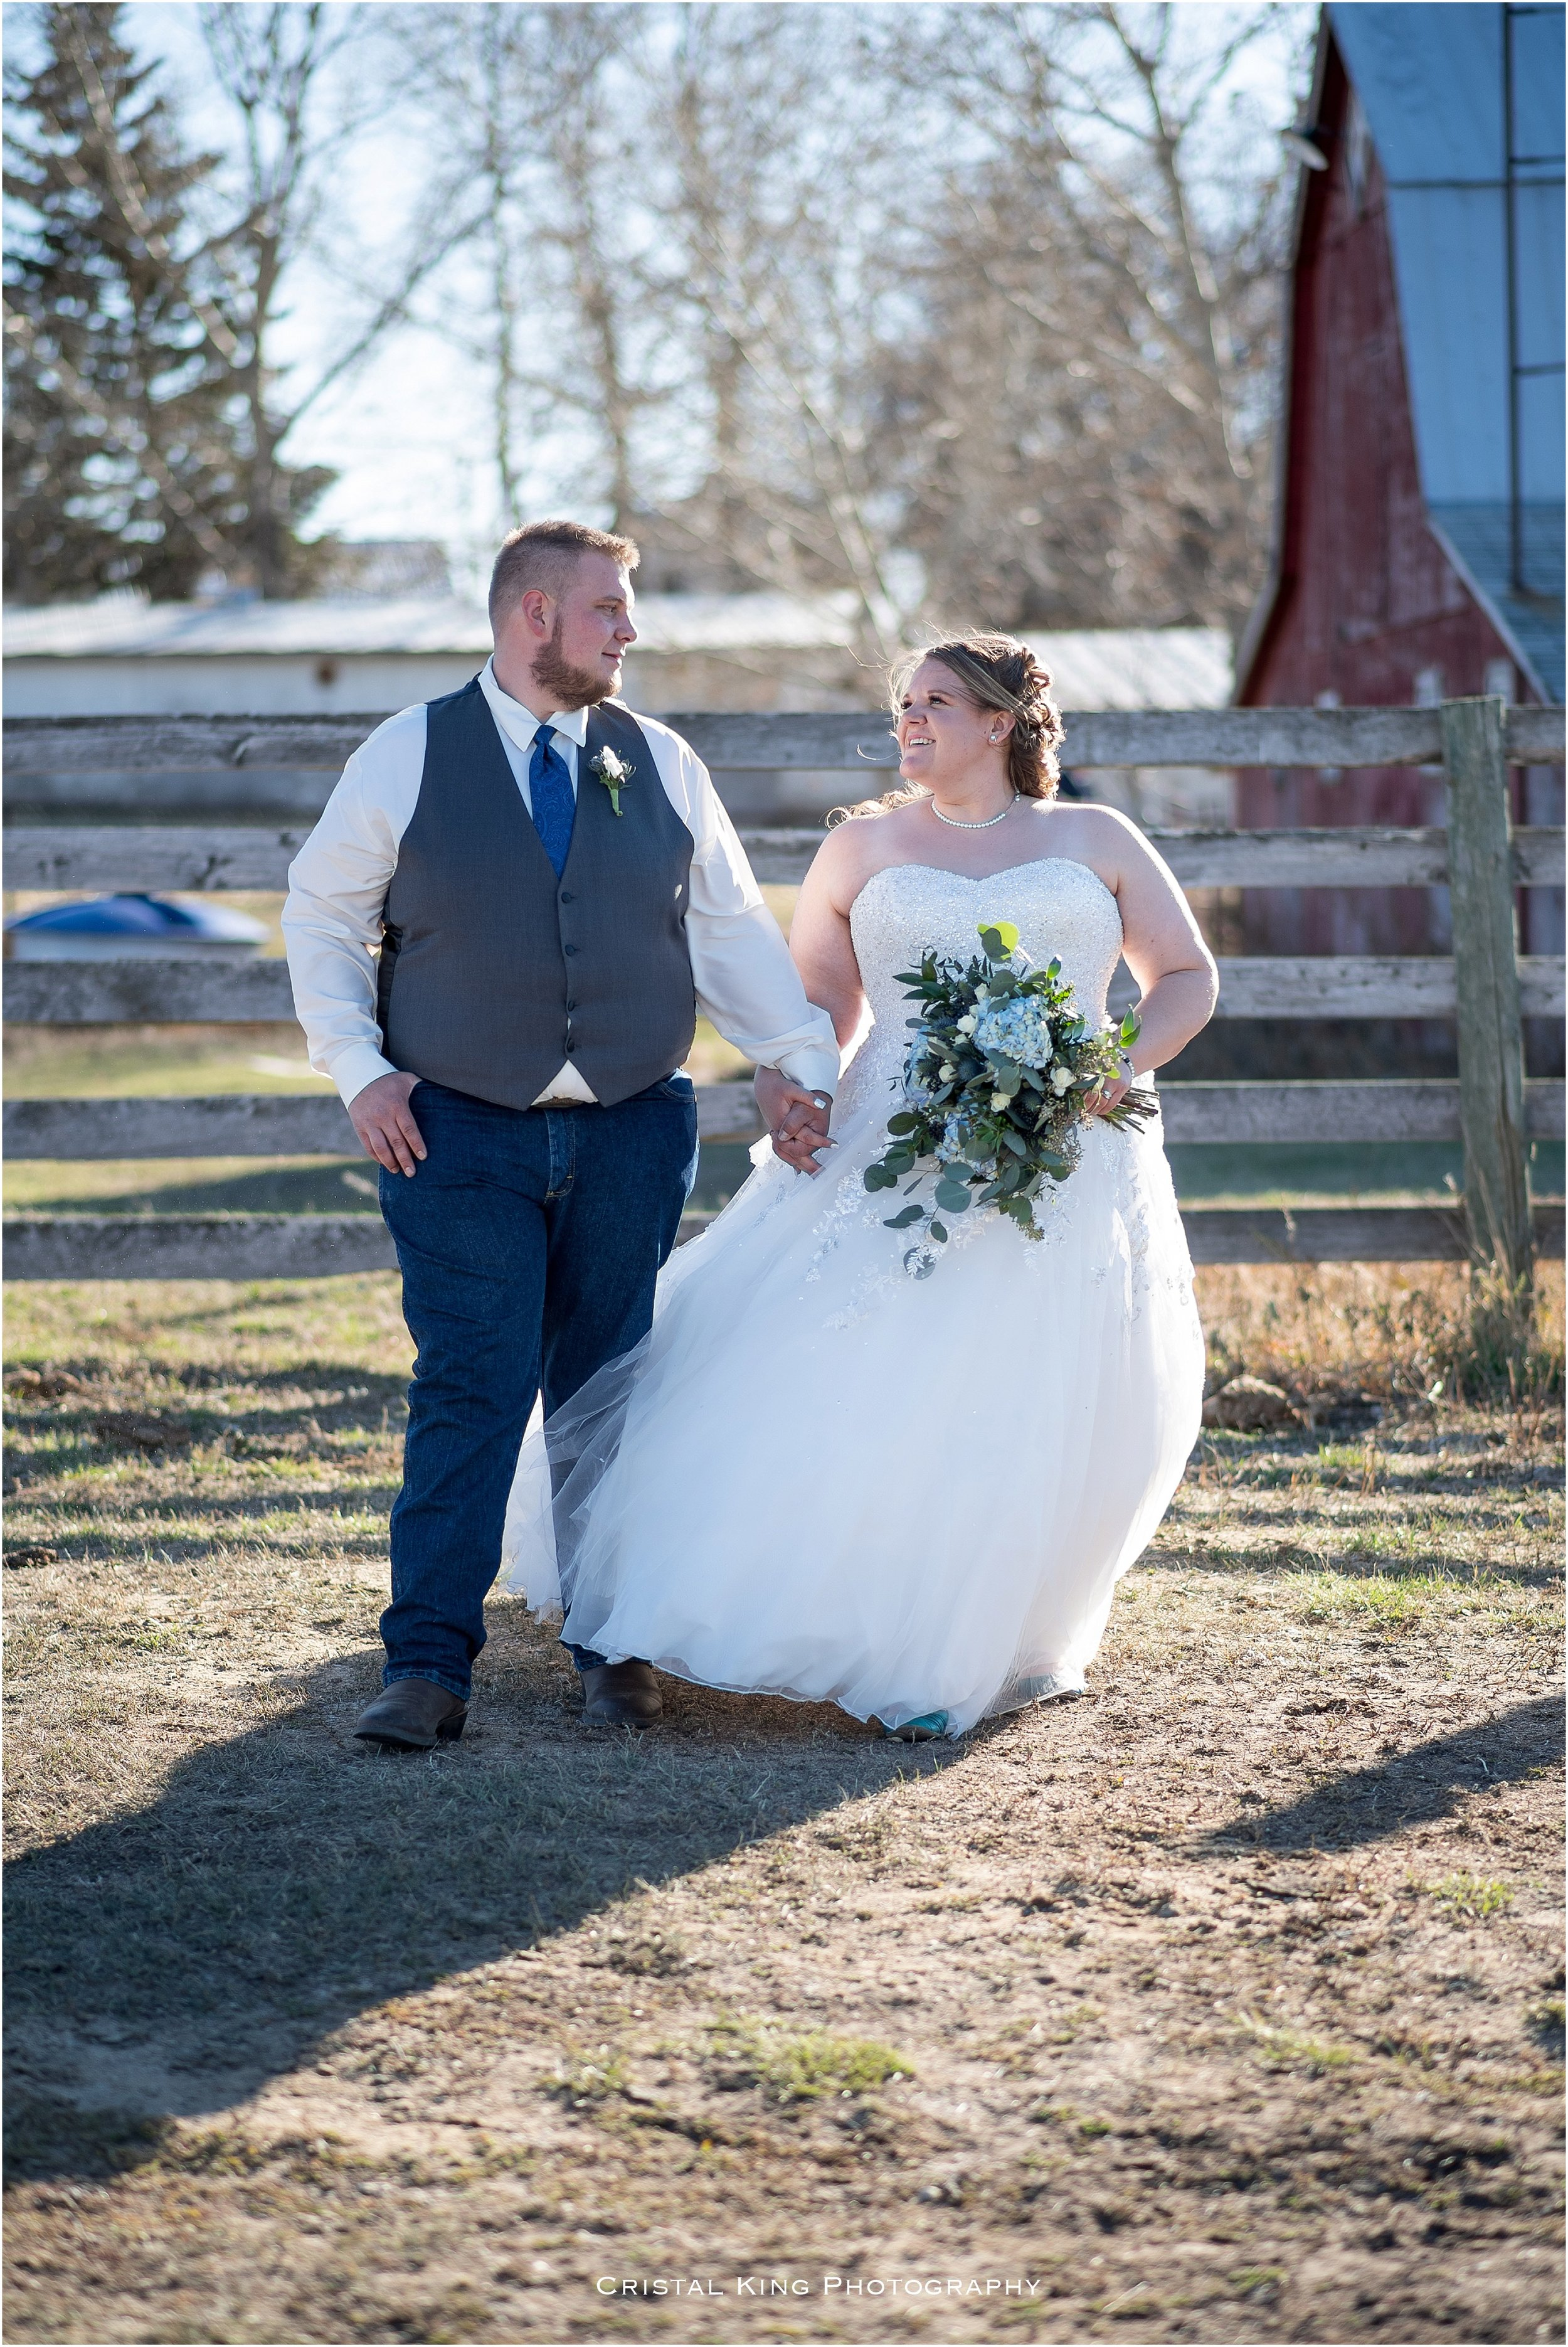 Tracy-Kyles-Wedding-101.jpg